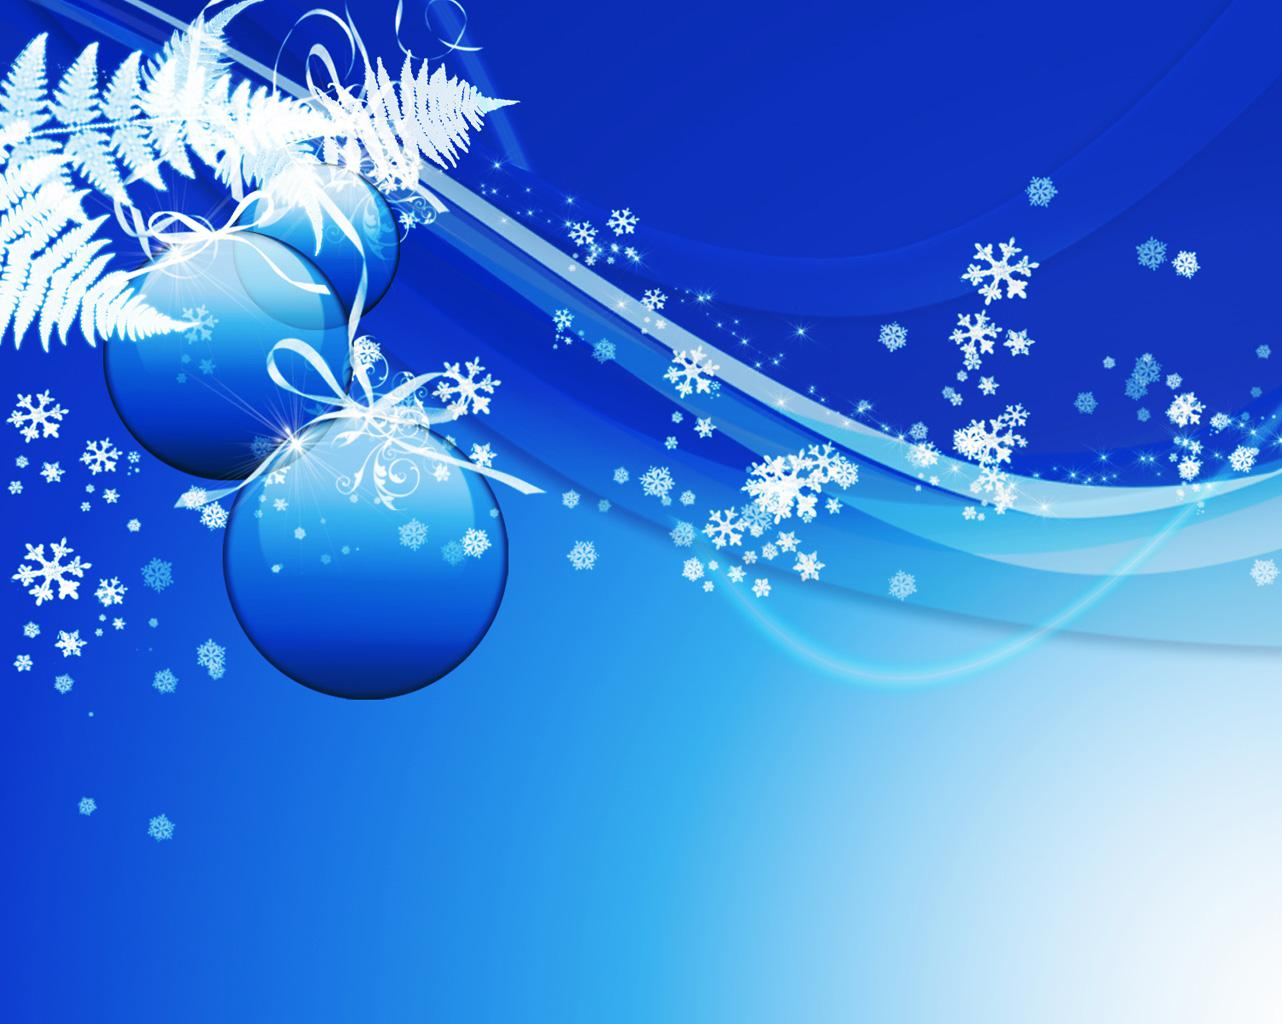 Happy New Year Christian Powerpoint Happy Engine 1282x1024